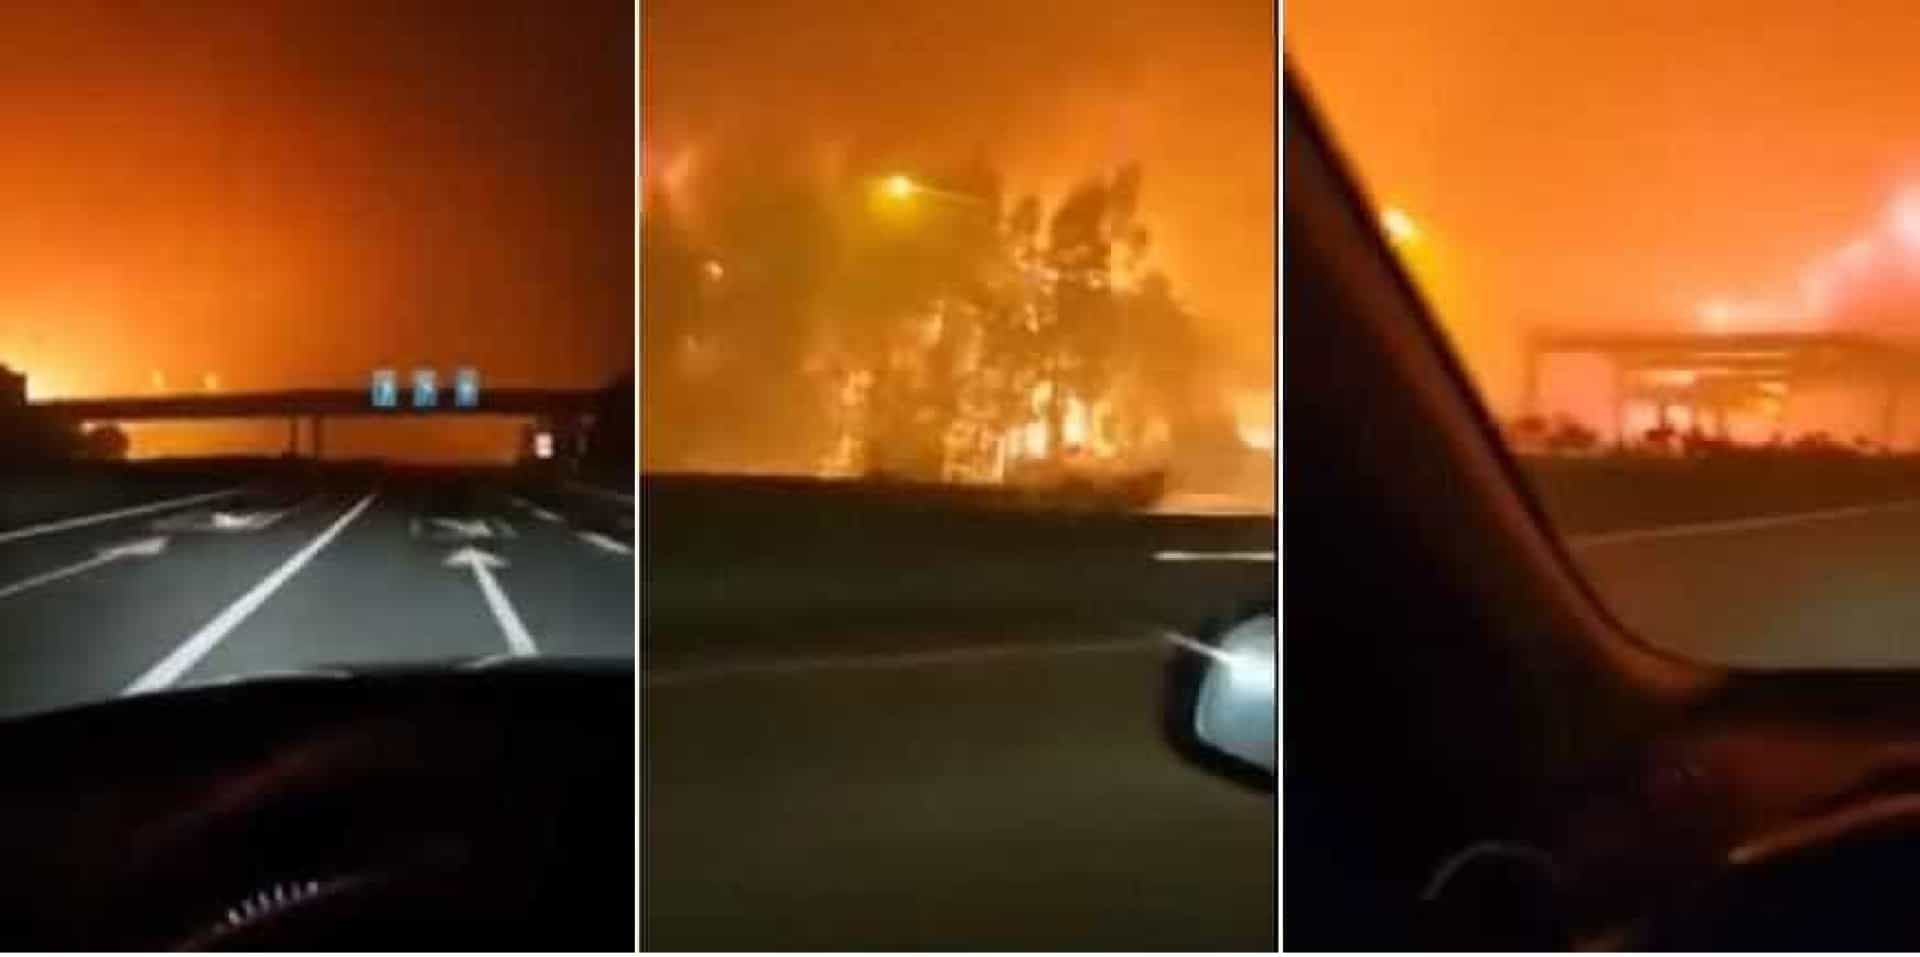 Vídeo mostra automobilista a fugir às chamas na autoestrada